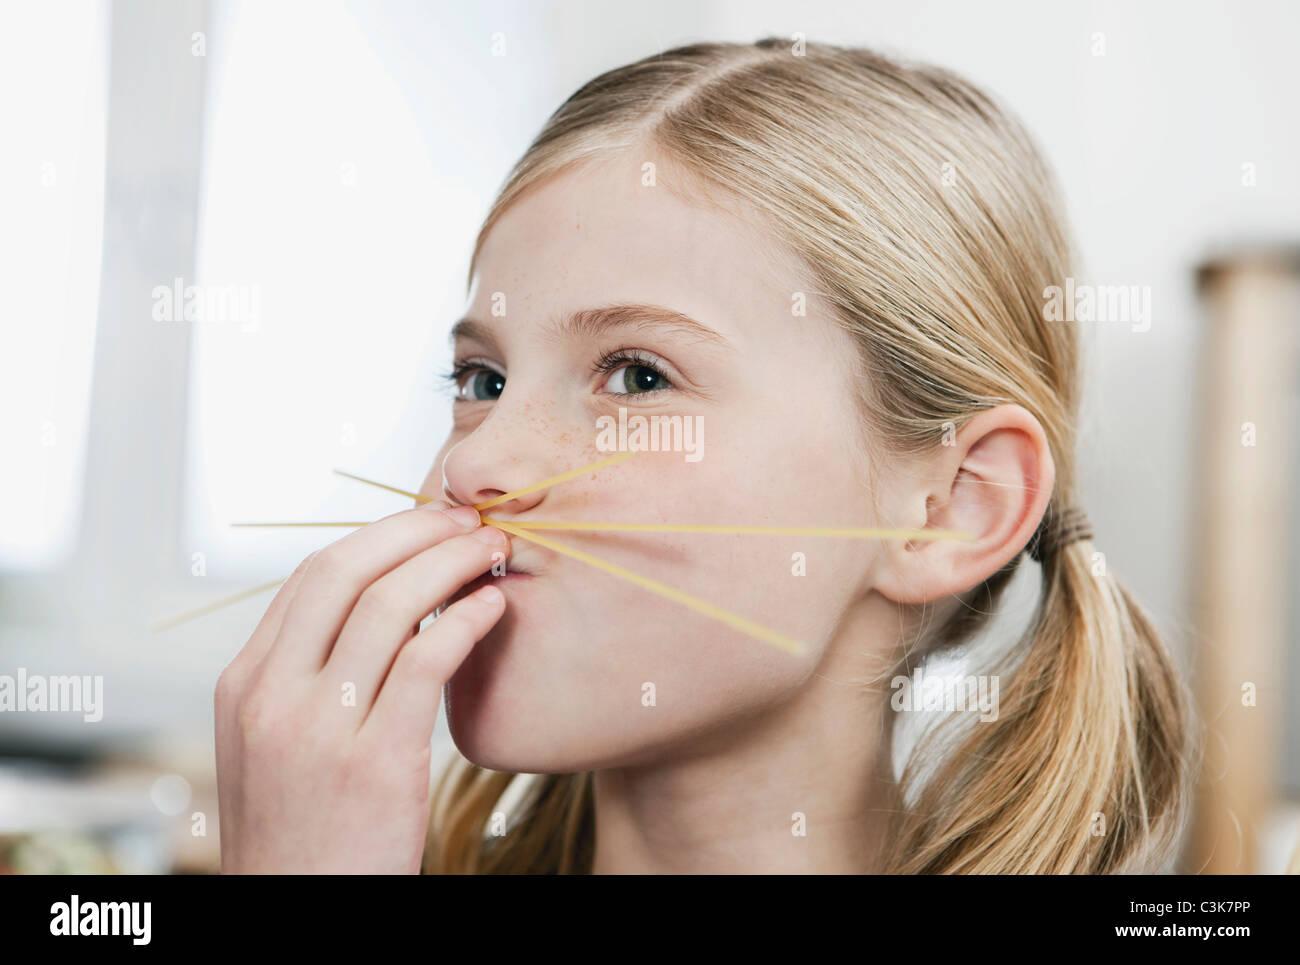 Germany, Cologne, Girl making spaghetti moustache - Stock Image